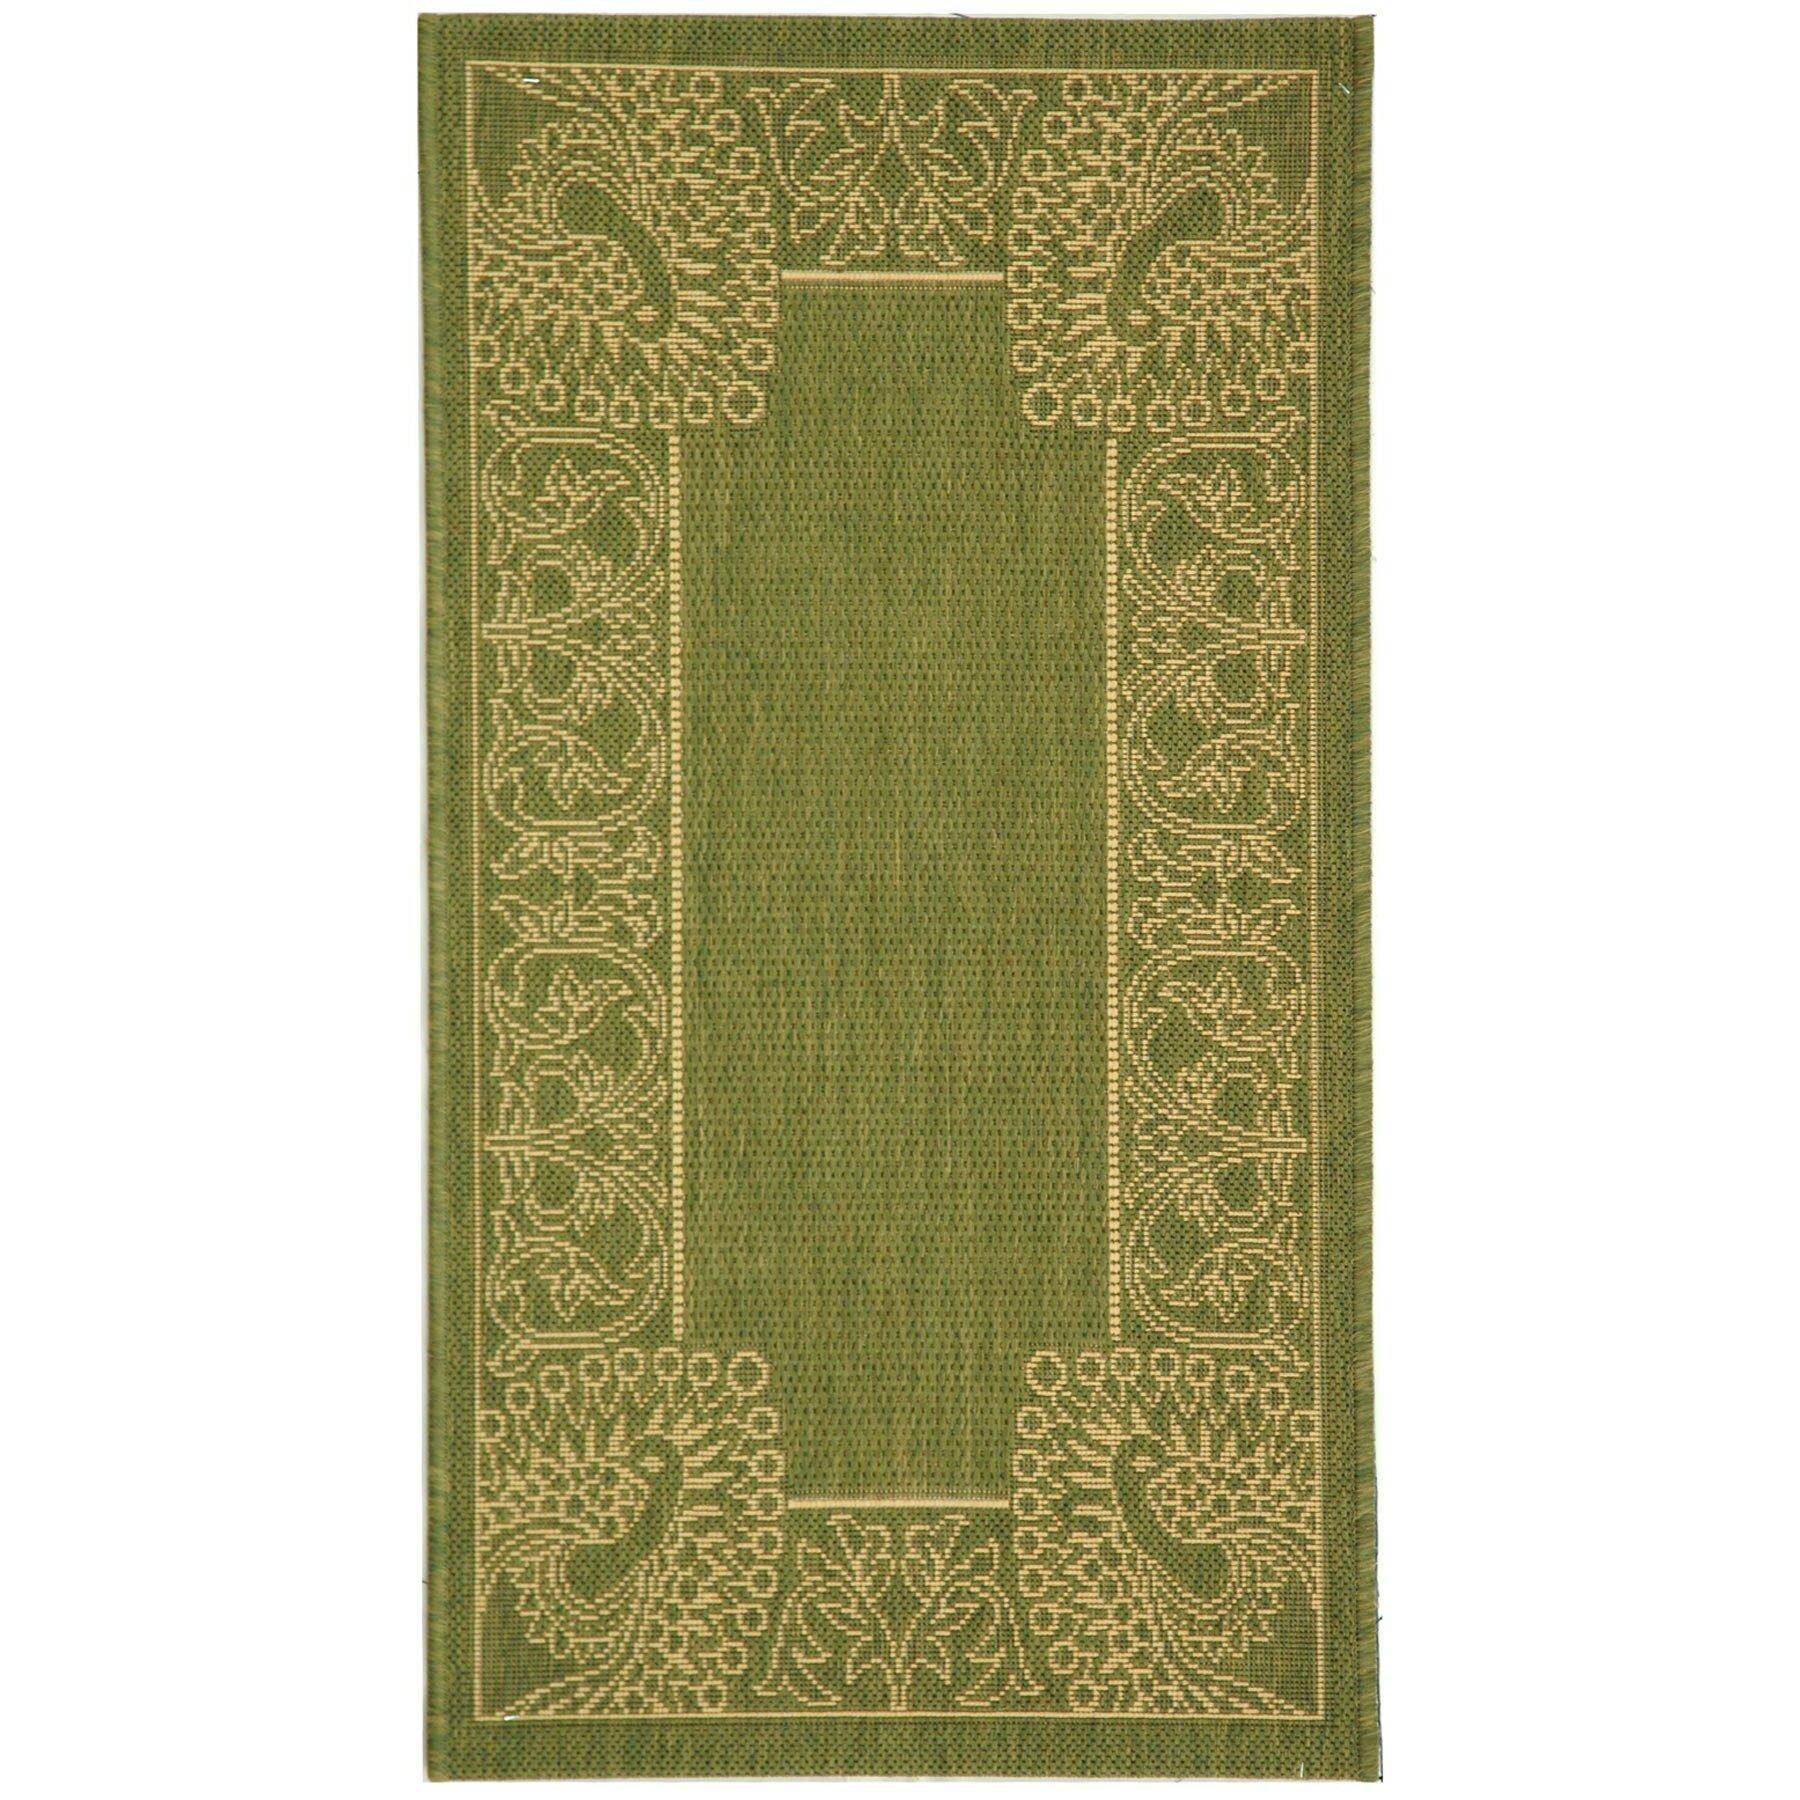 Safavieh courtyard olive natural rug reviews wayfair for Safavieh rugs